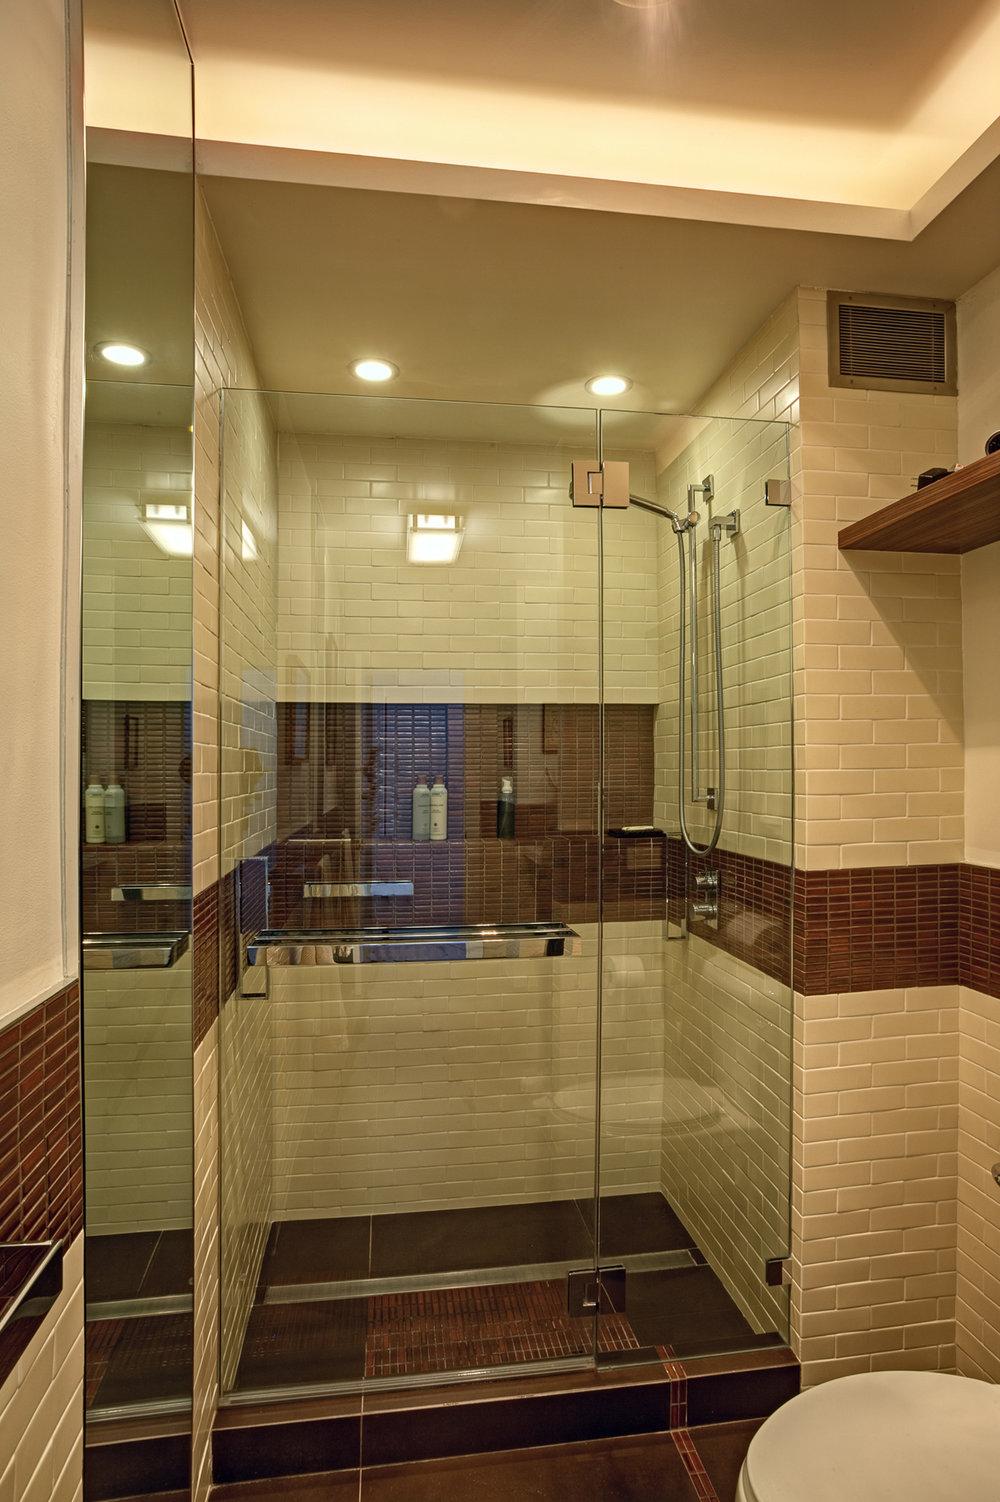 Kaplan-Architects-high-rise-interior-remodeled-master-bathroom-shower.jpg